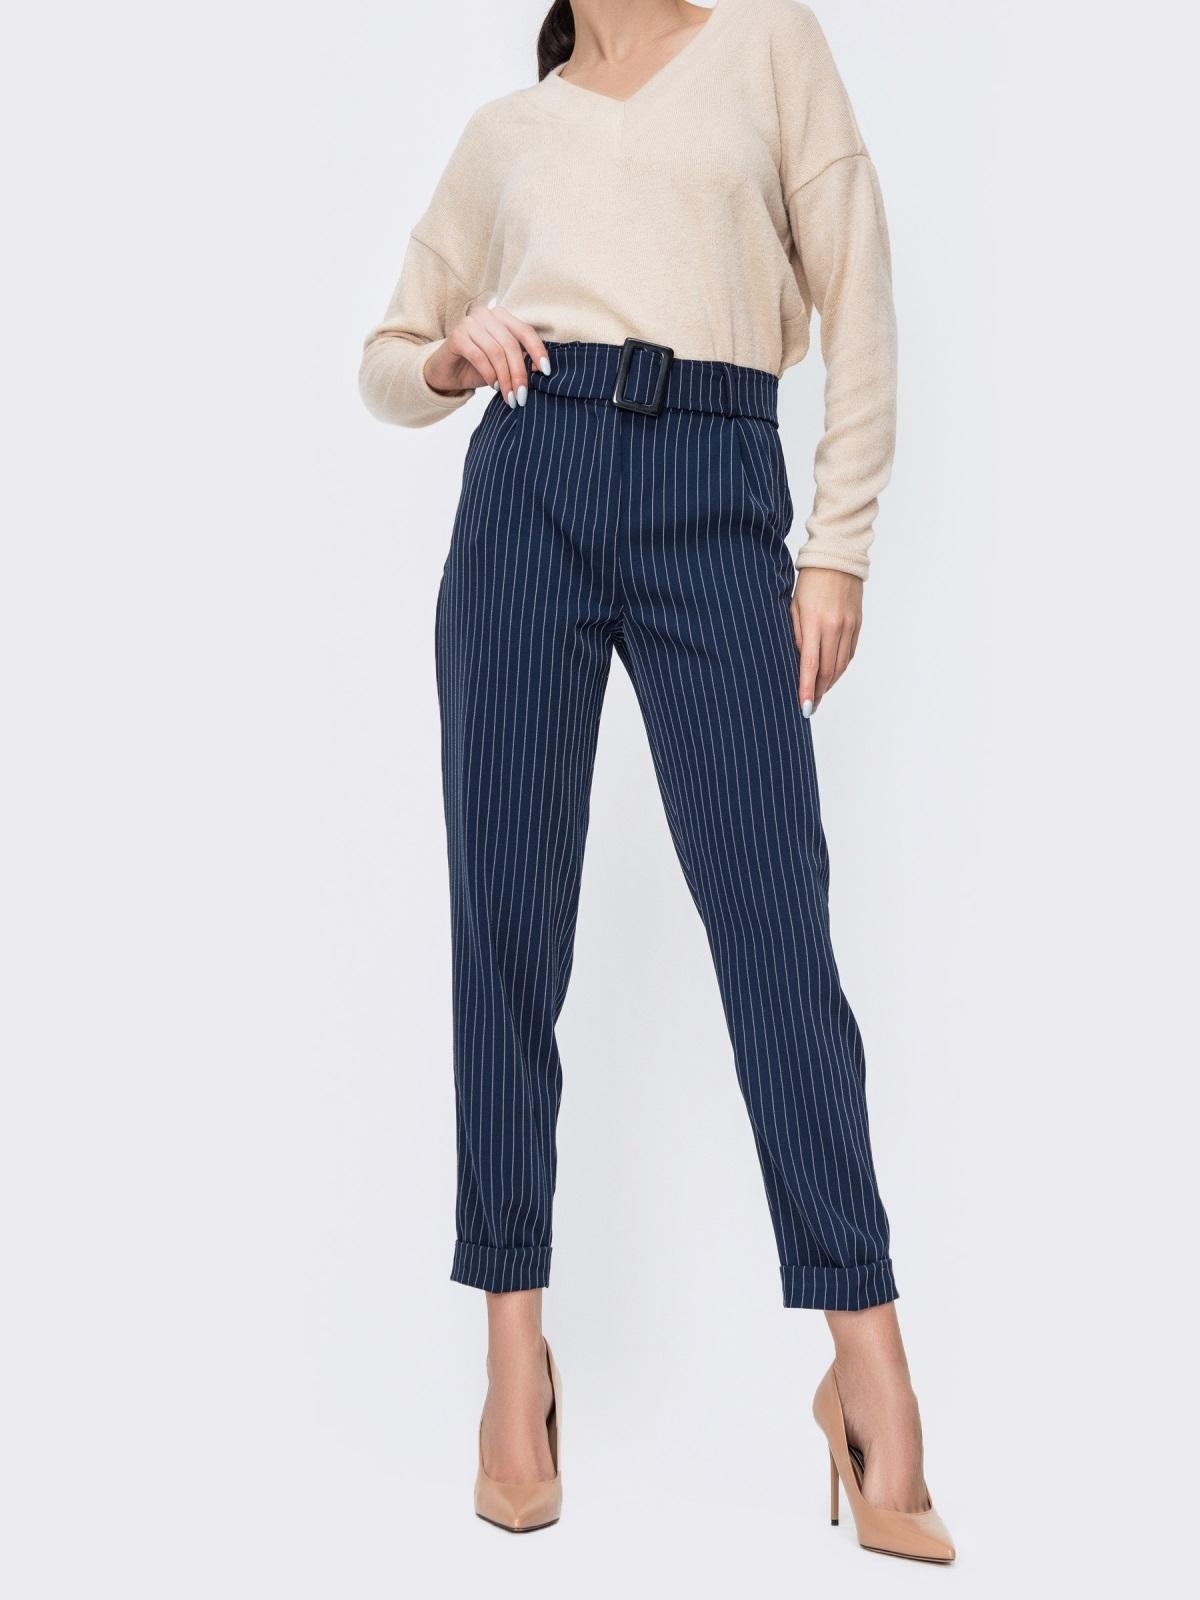 Зауженные брюки в полоску тёмно-синие 45031, фото 1